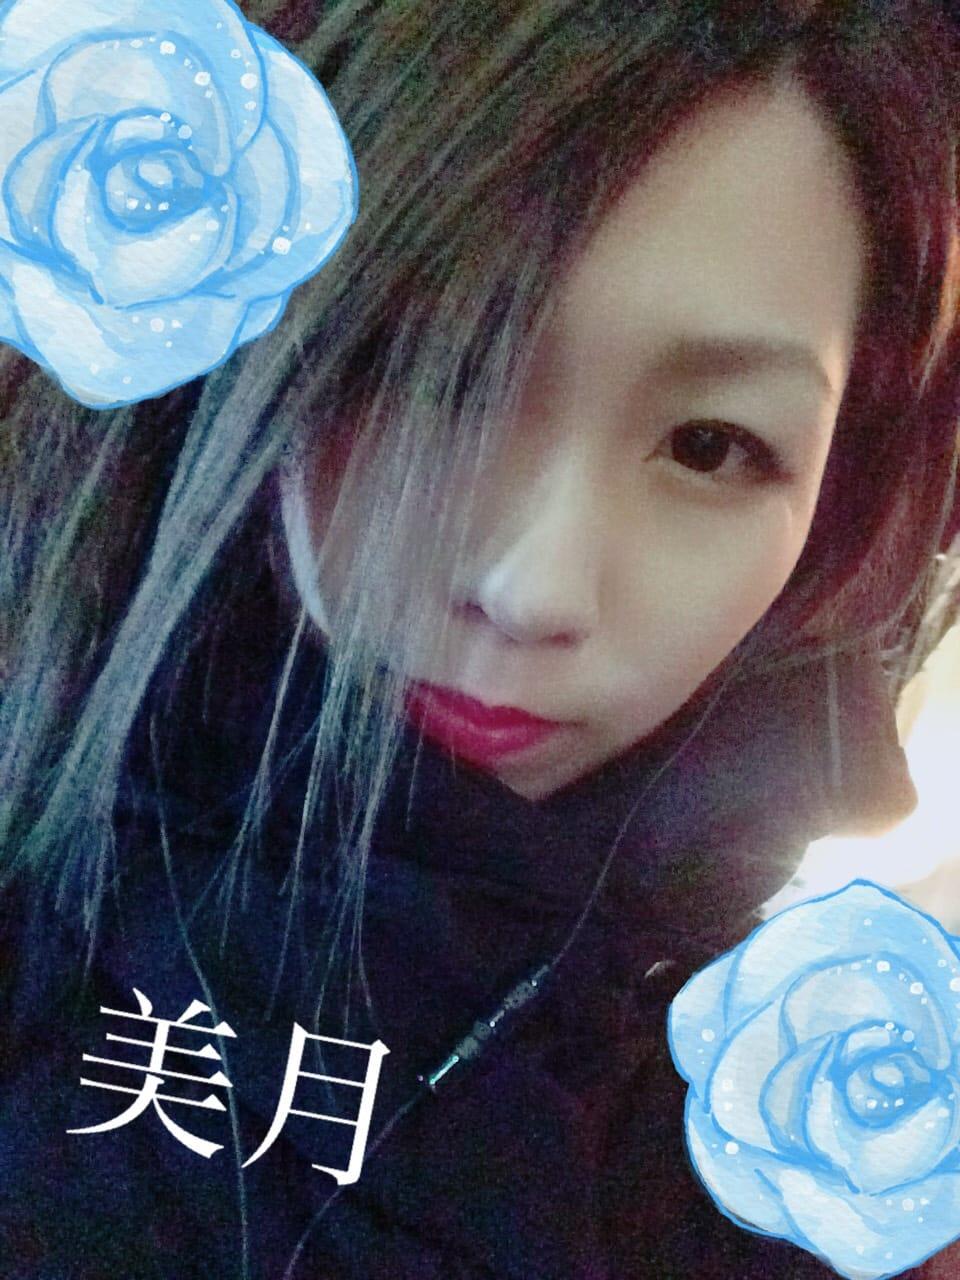 「夜。」01/11(木) 20:37 | 美月 桜の写メ・風俗動画